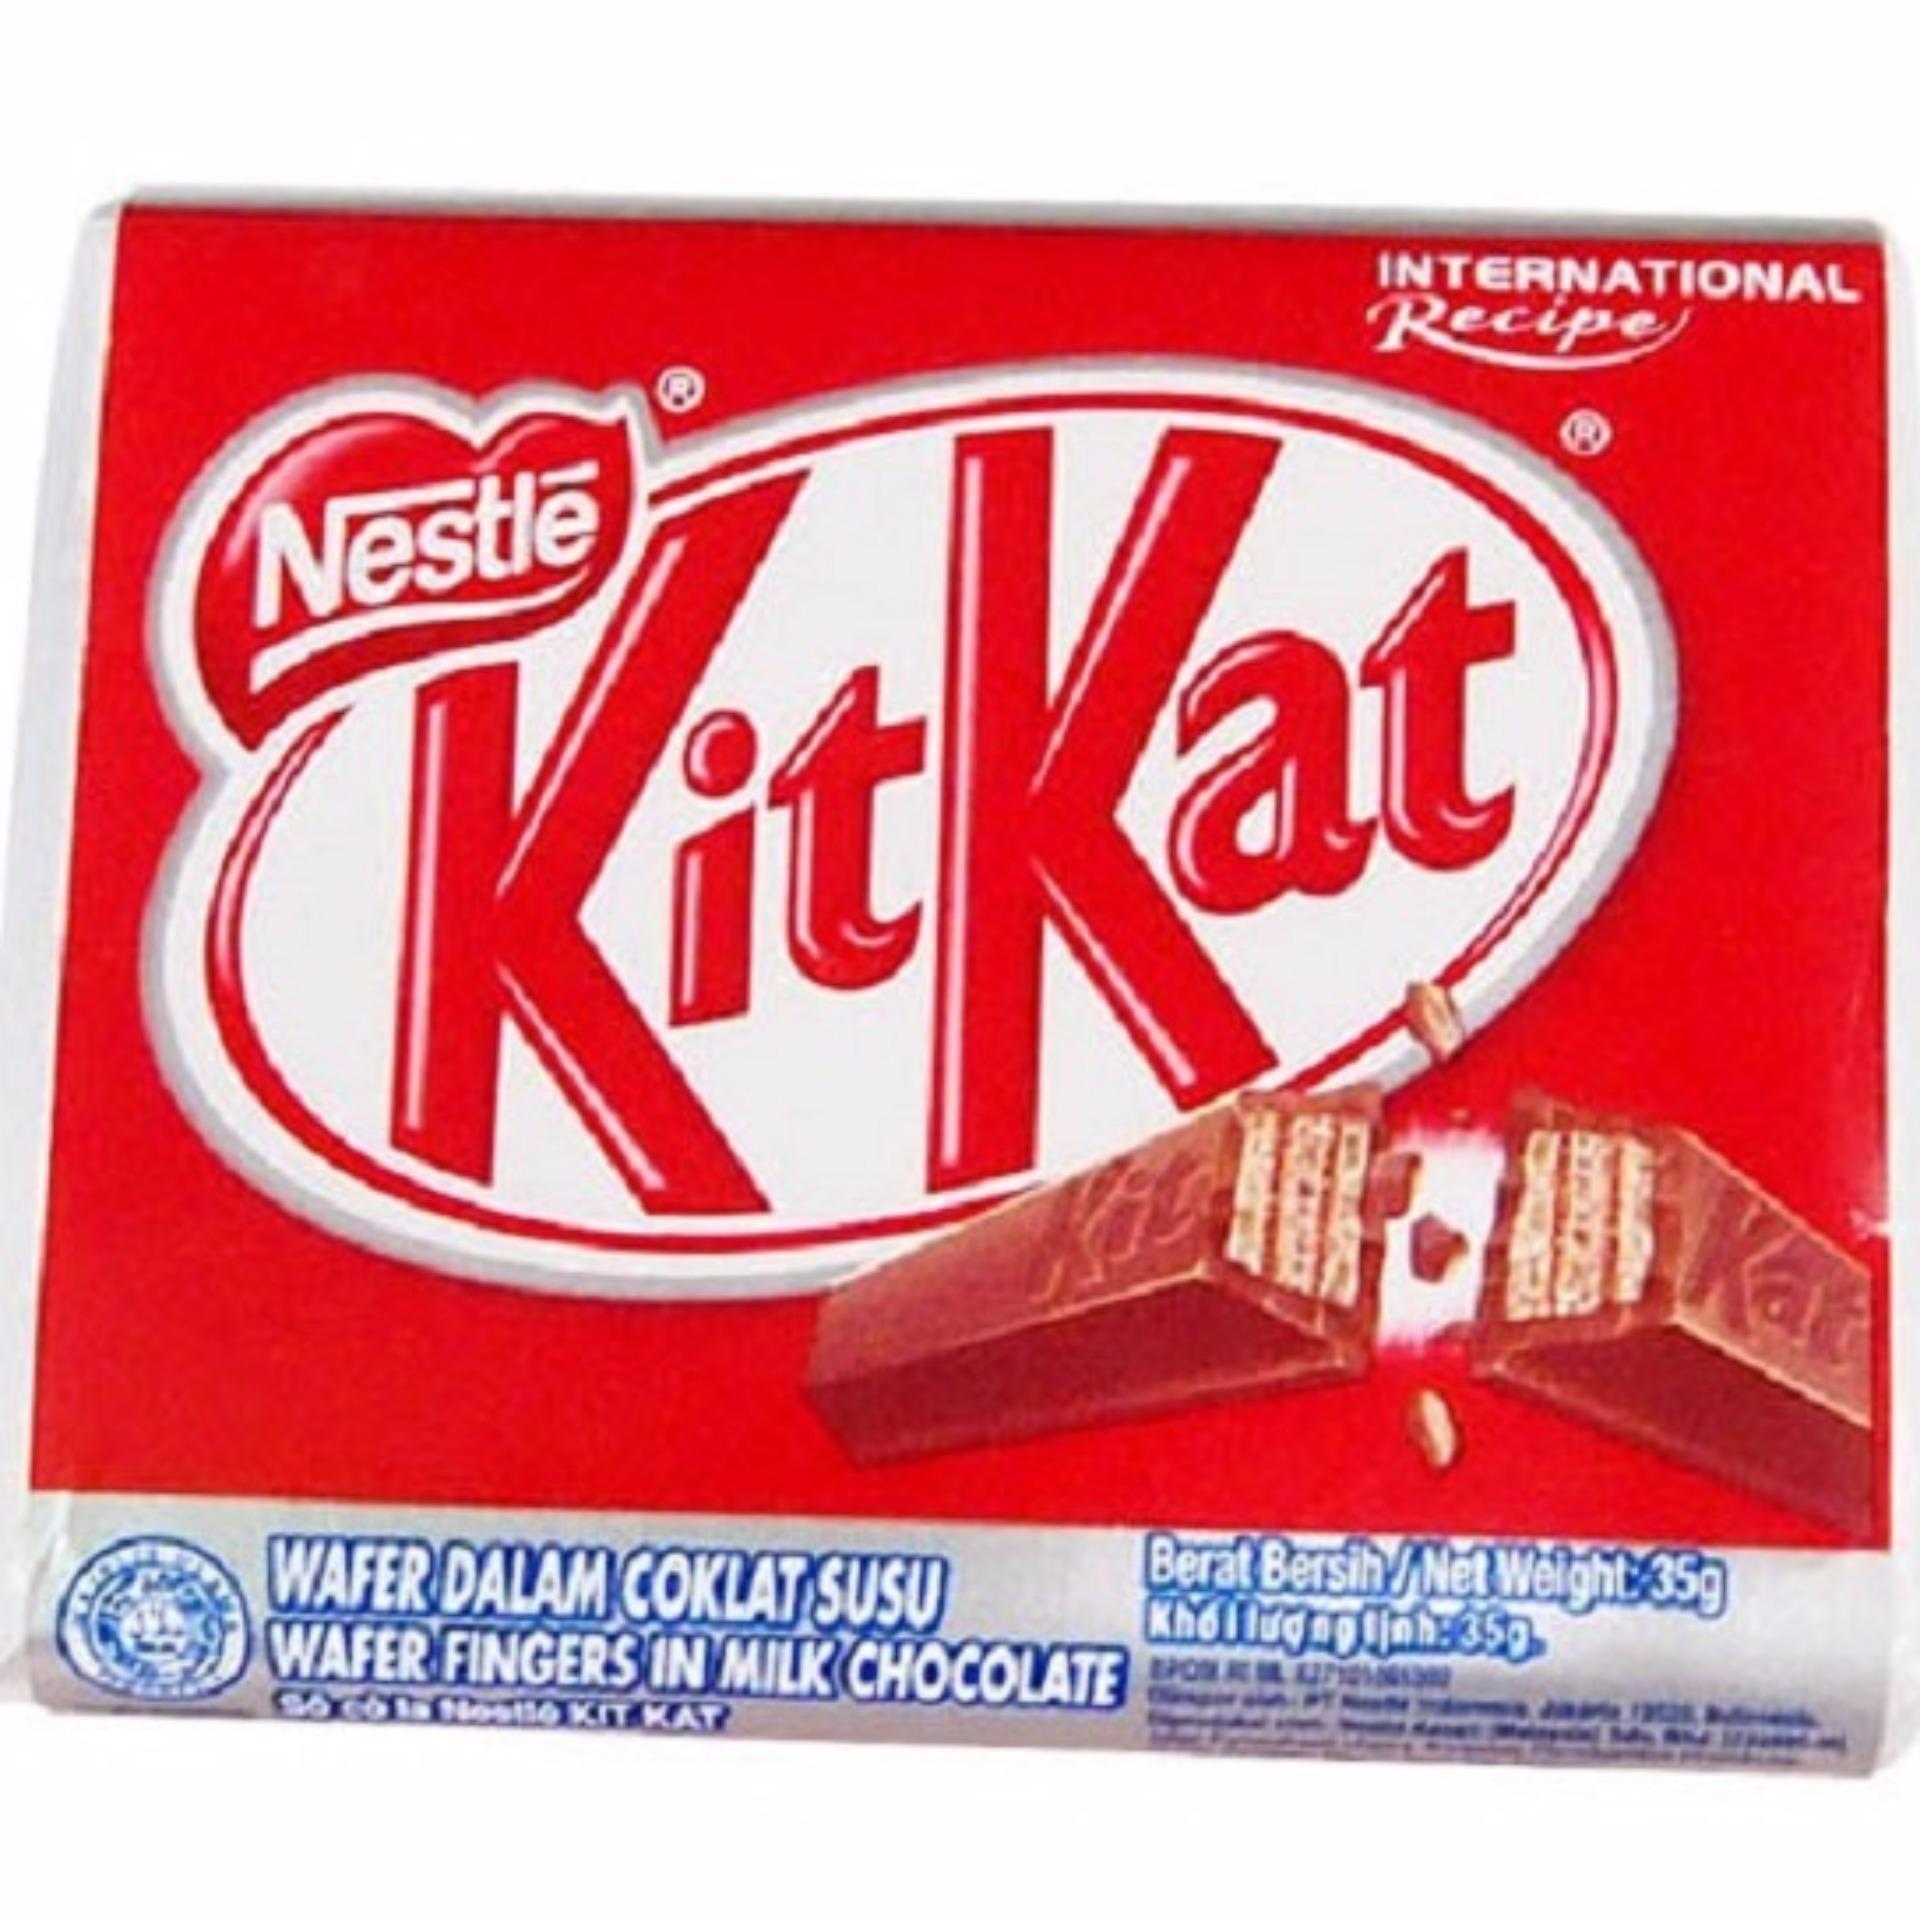 Cách mua Thanh Chocolate KitKat 4F